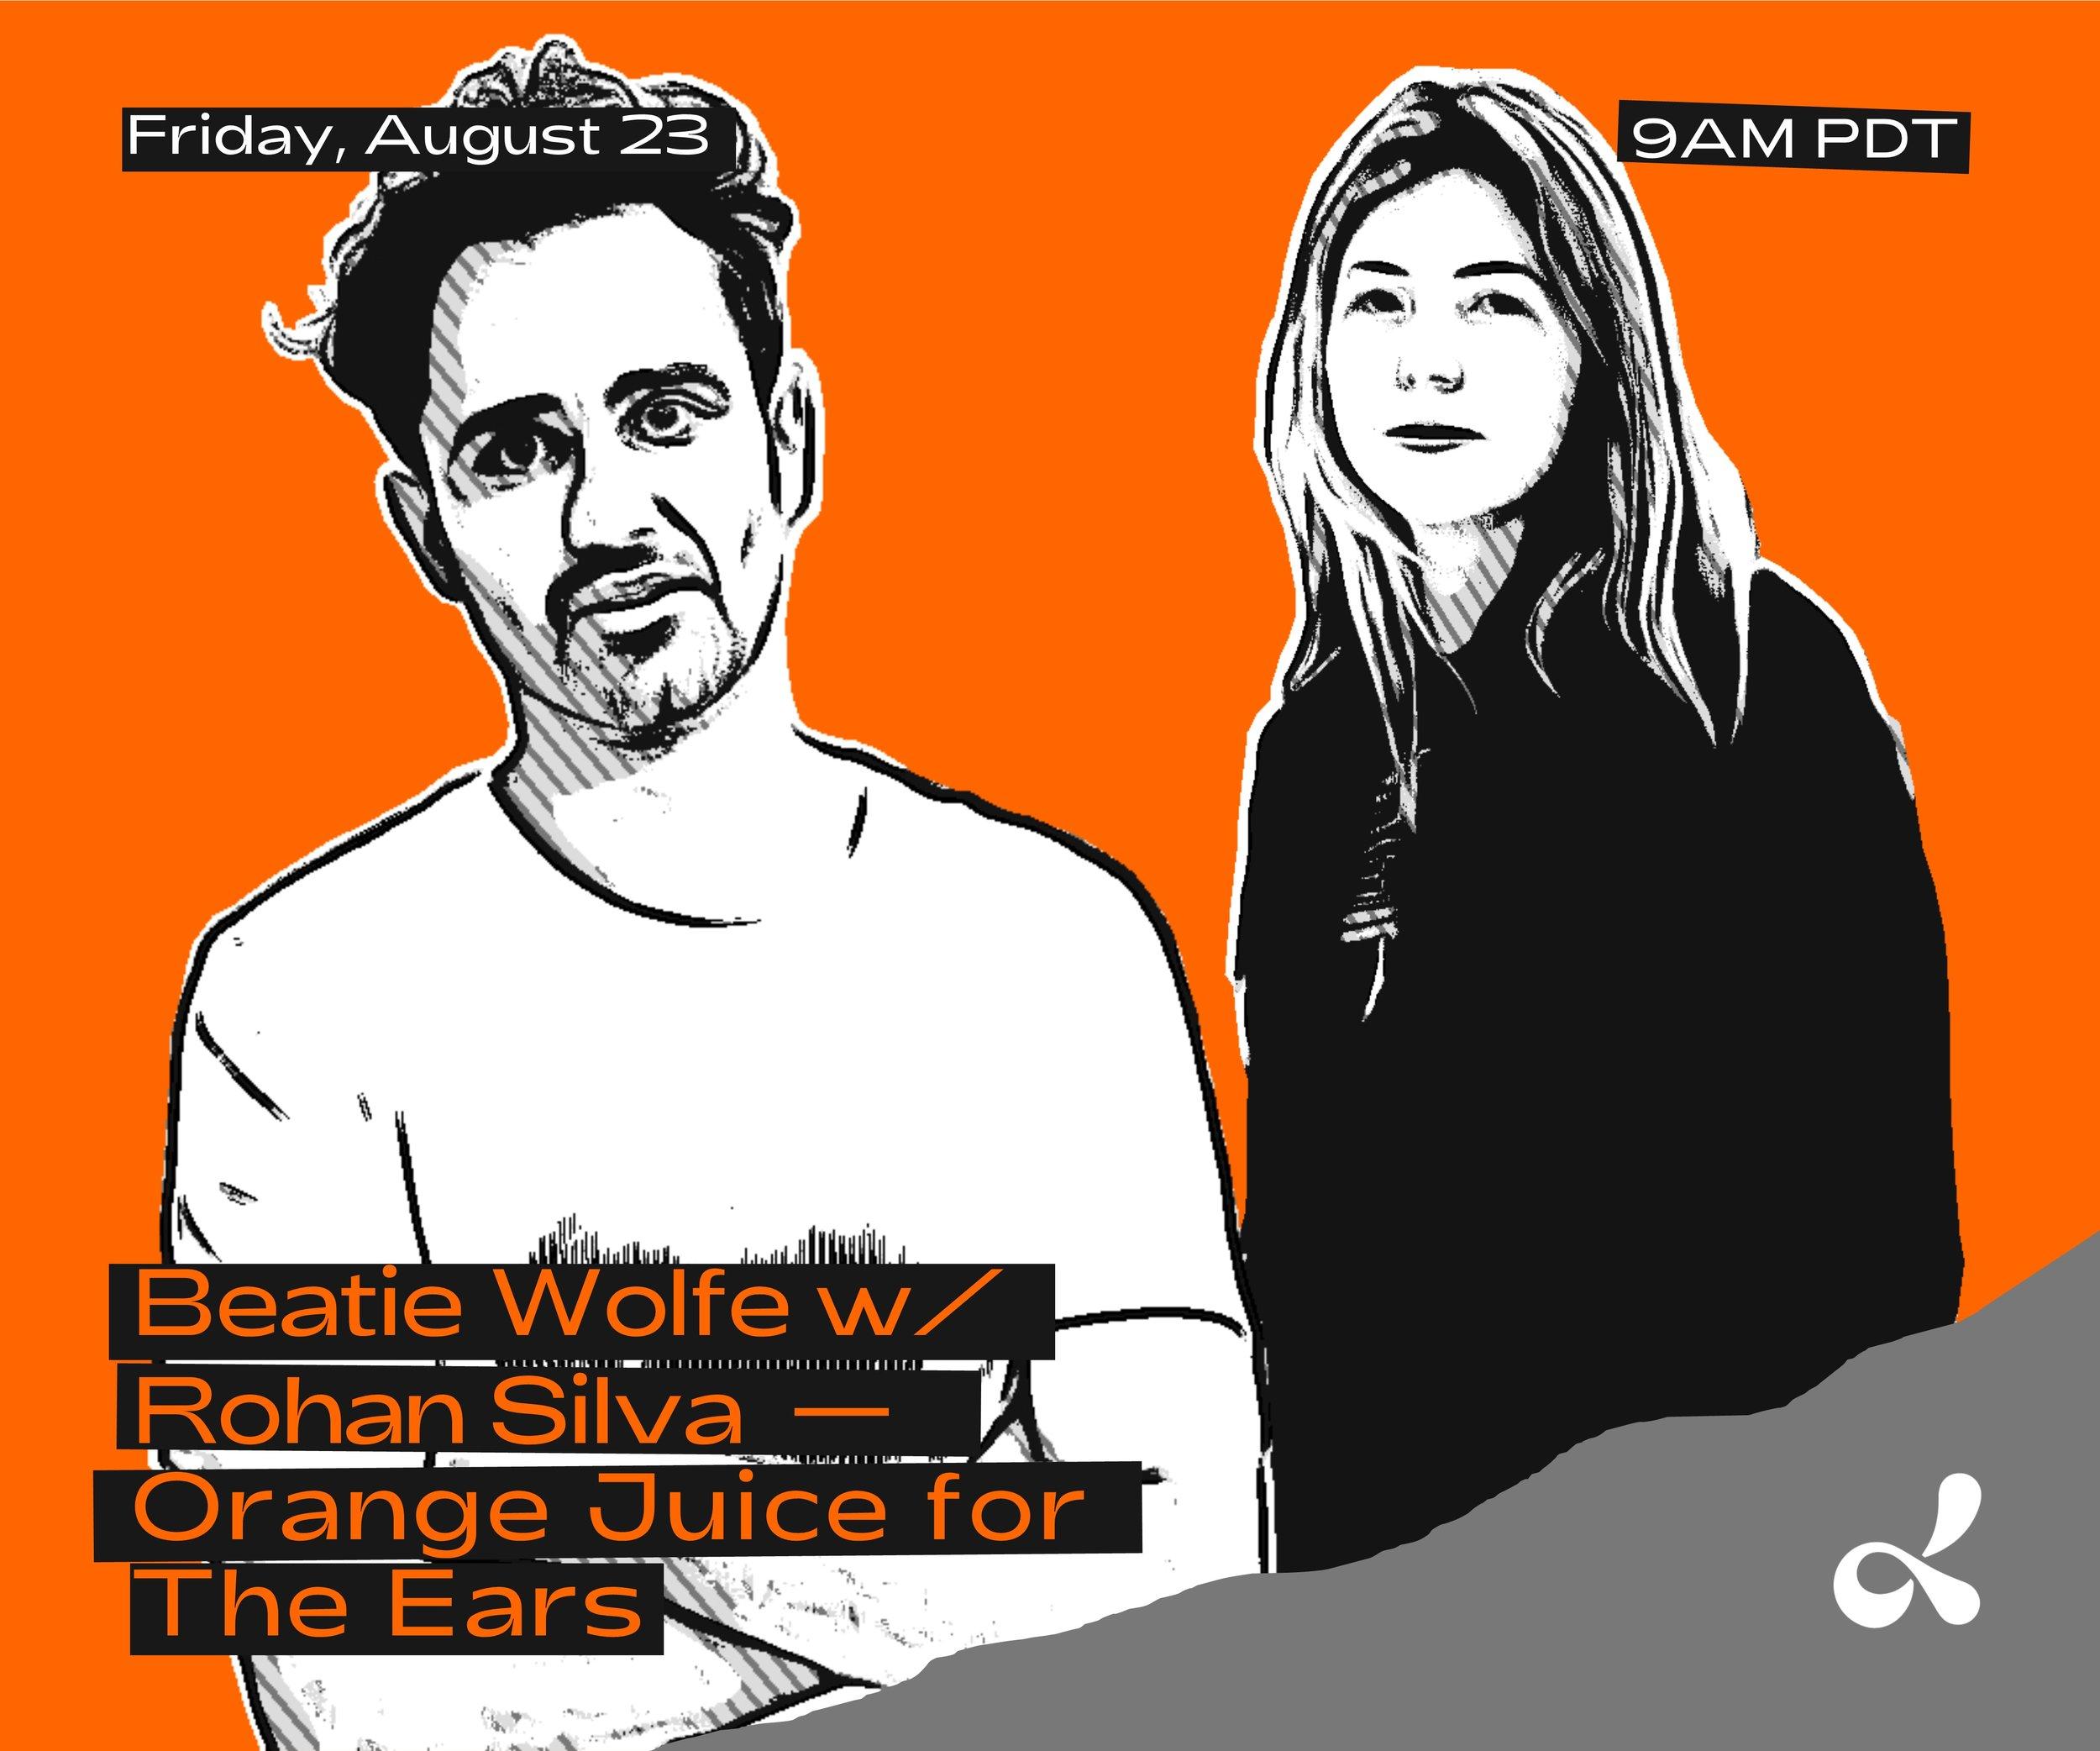 ep.10 Rohan Silva on dublab radio with Beatie Wolfe - 3by4.jpg